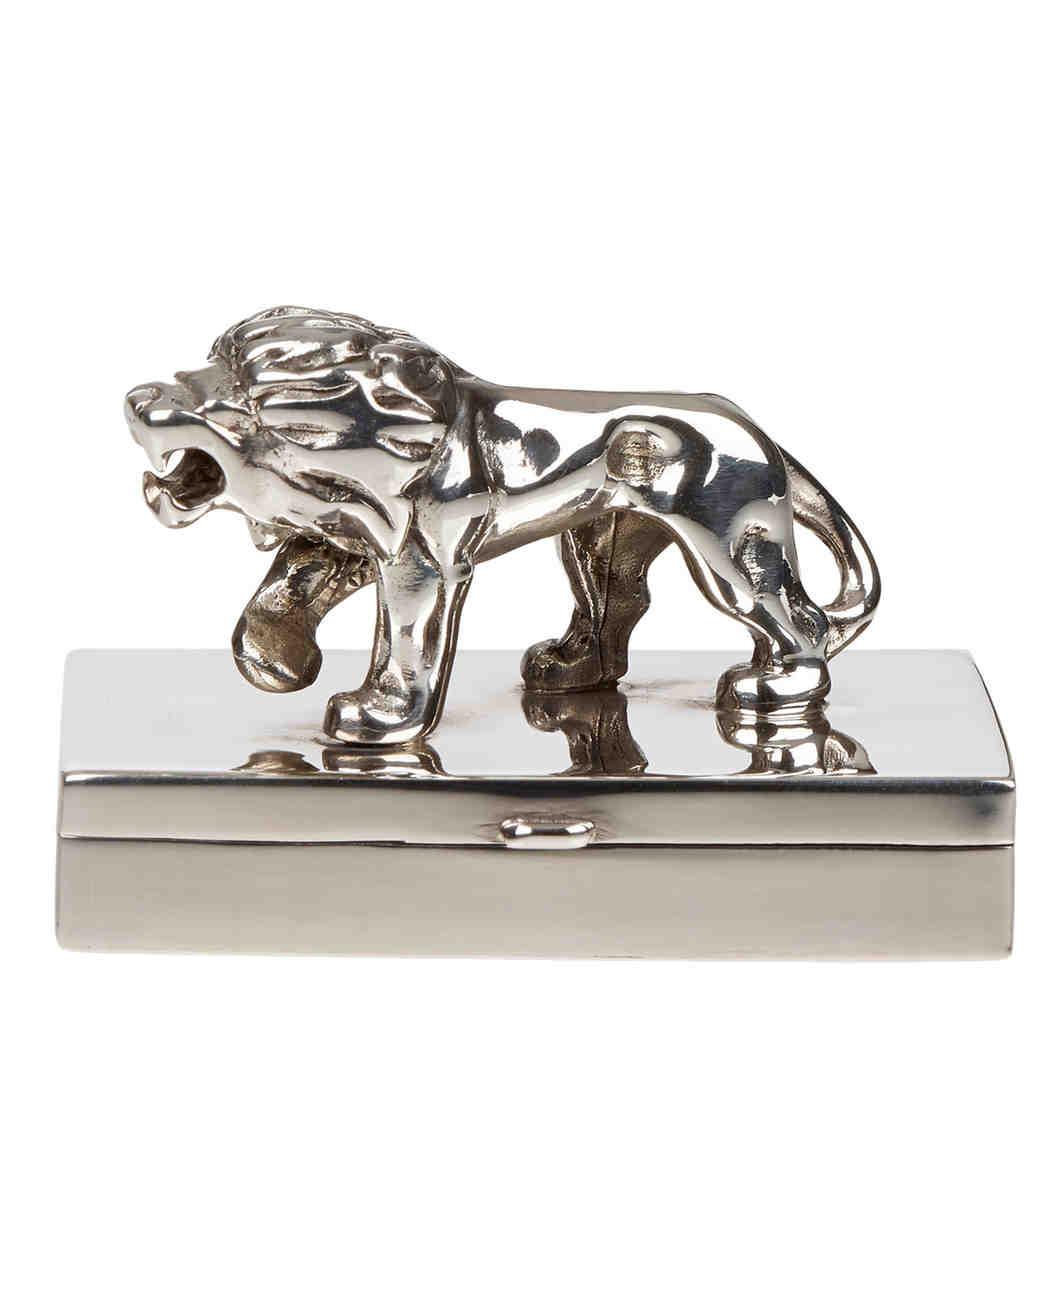 ring-boxes-barneys-ari-d-norman-sterling-lion-pillbox-0115.jpg